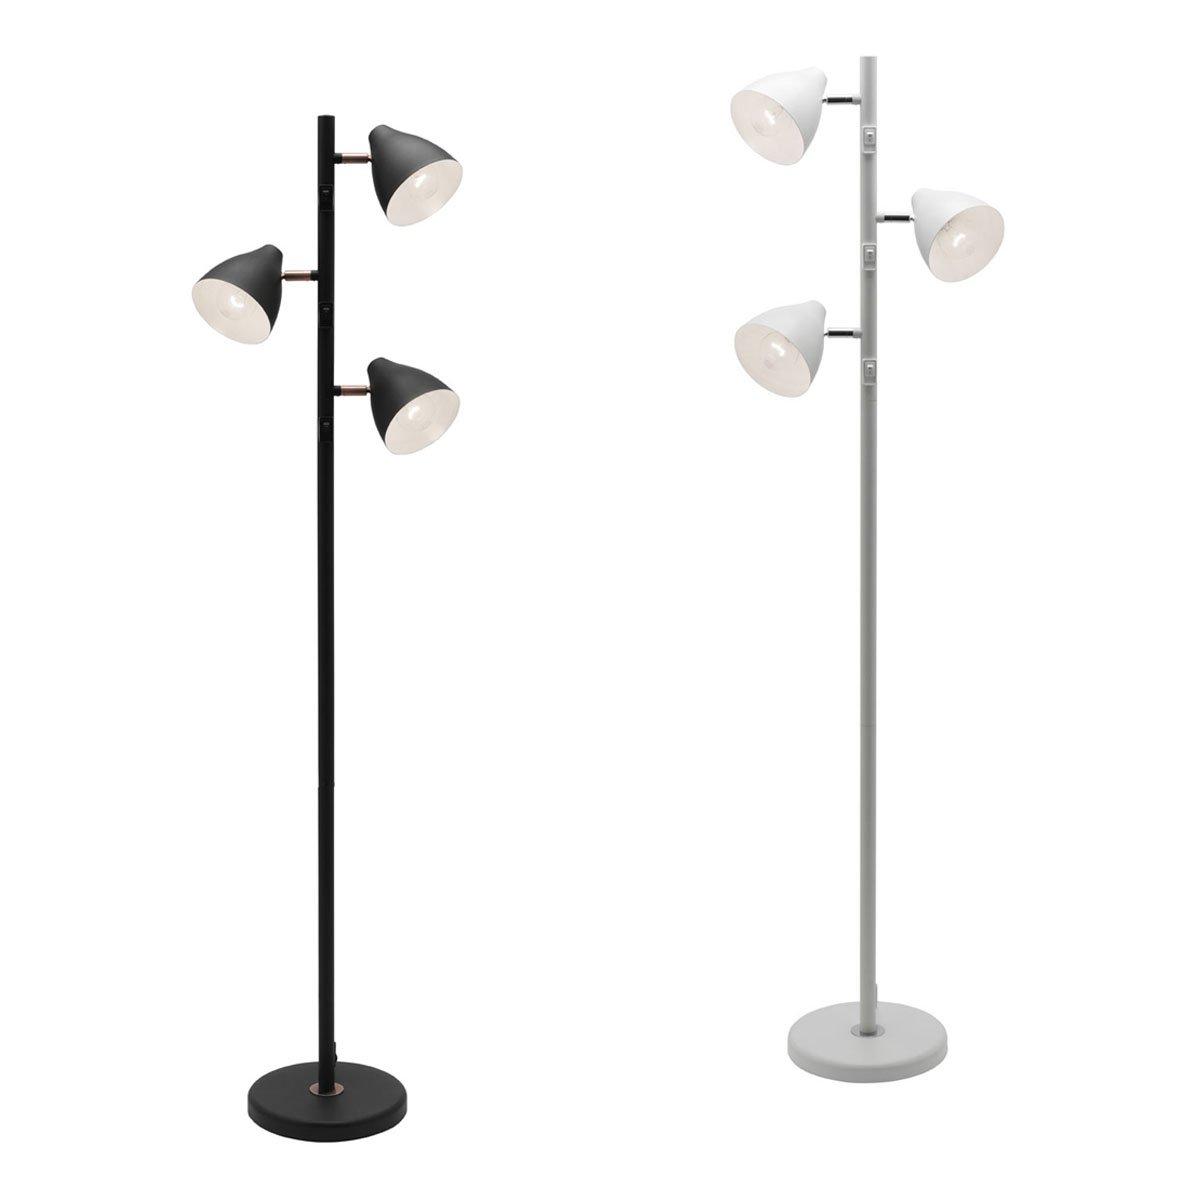 Jeremy 3 light floor lamp f co aloadofball Choice Image